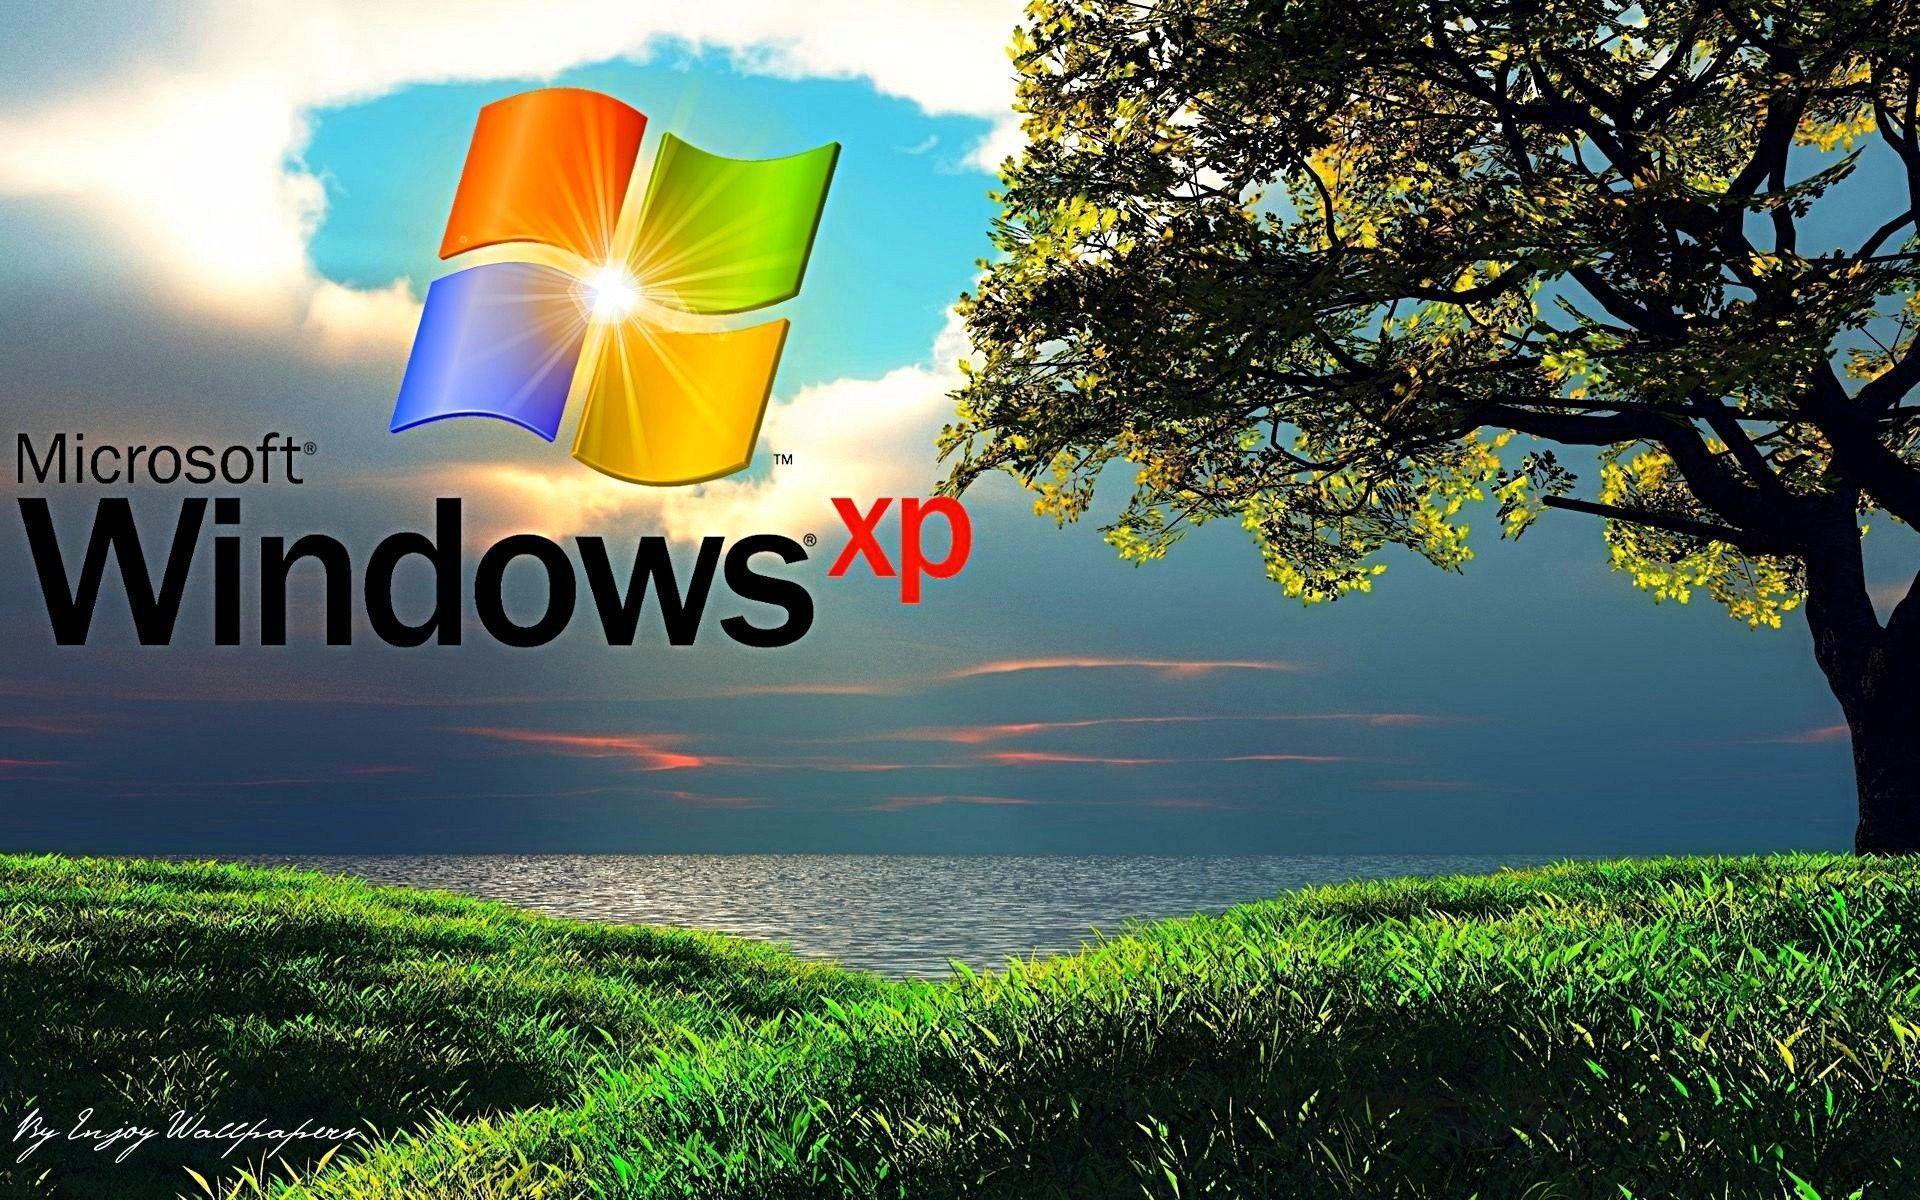 Windows XP Wallpapers HD Wallpaper